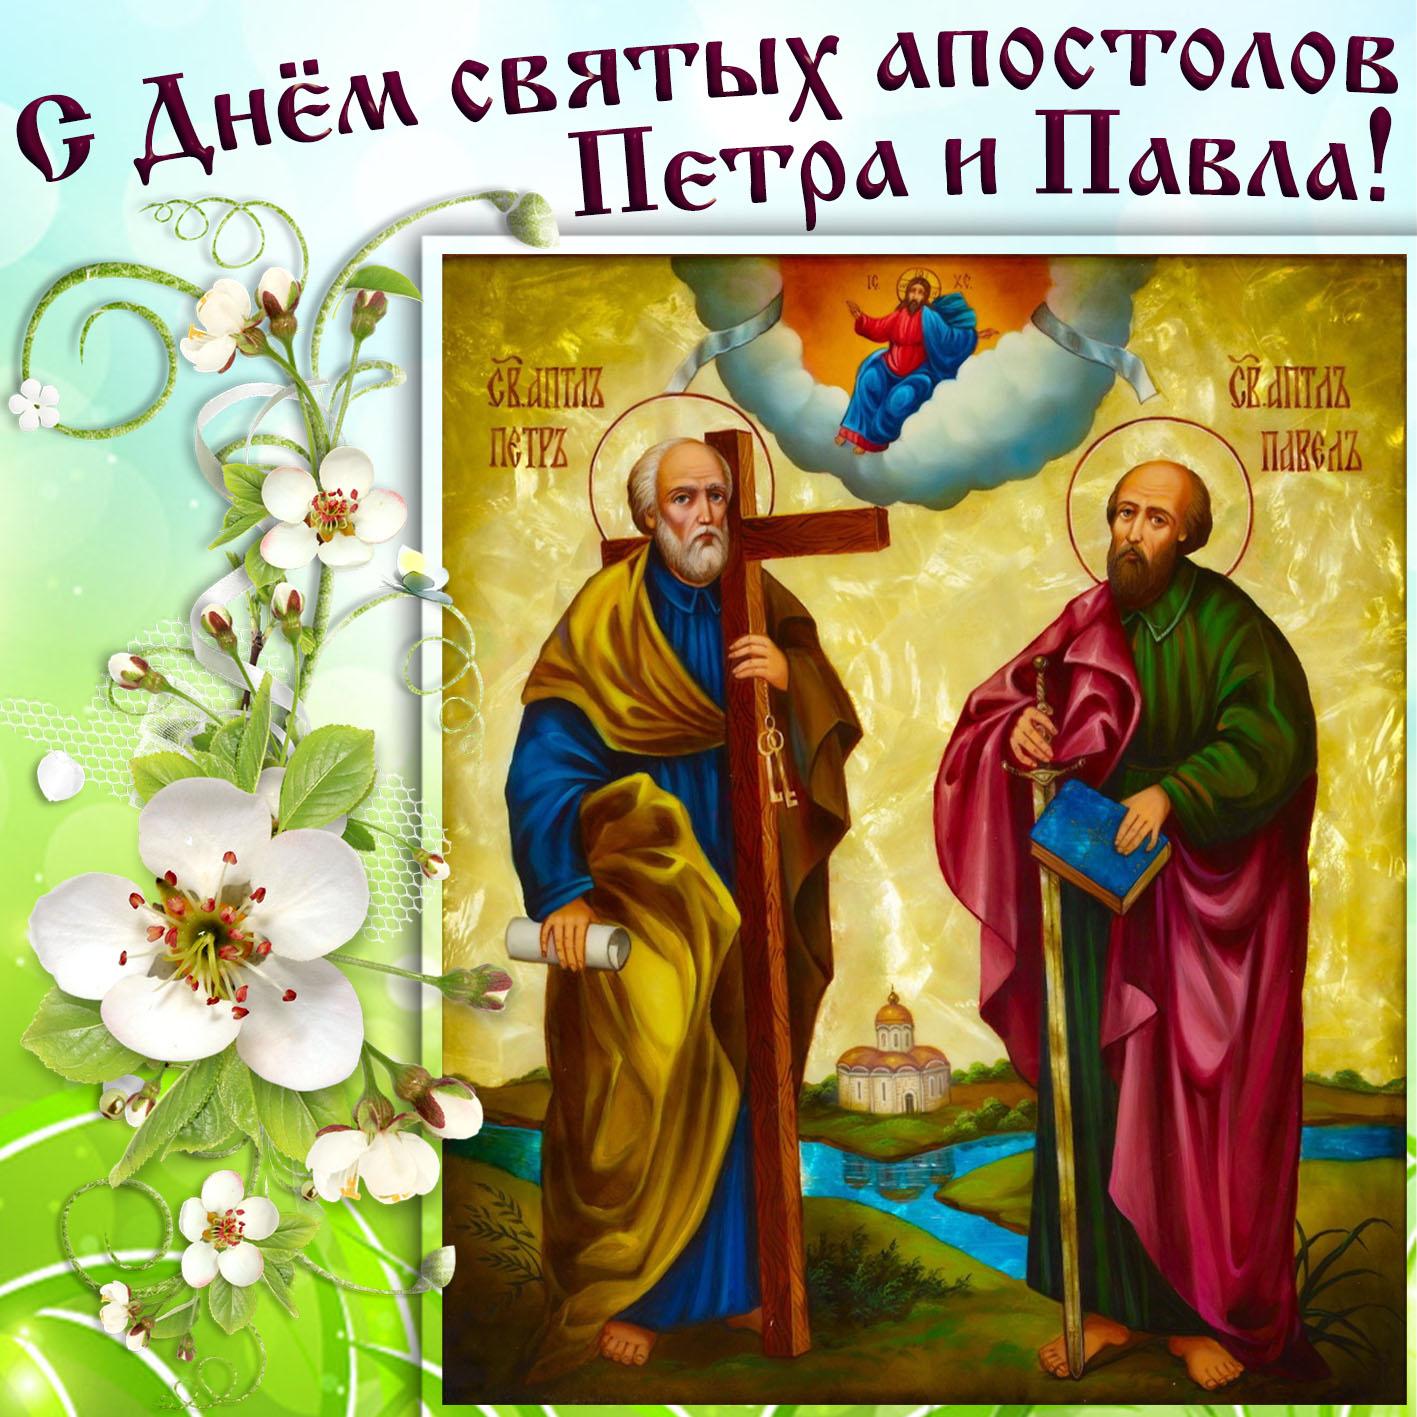 Юбилеем, картинки с праздником святого петра и павла